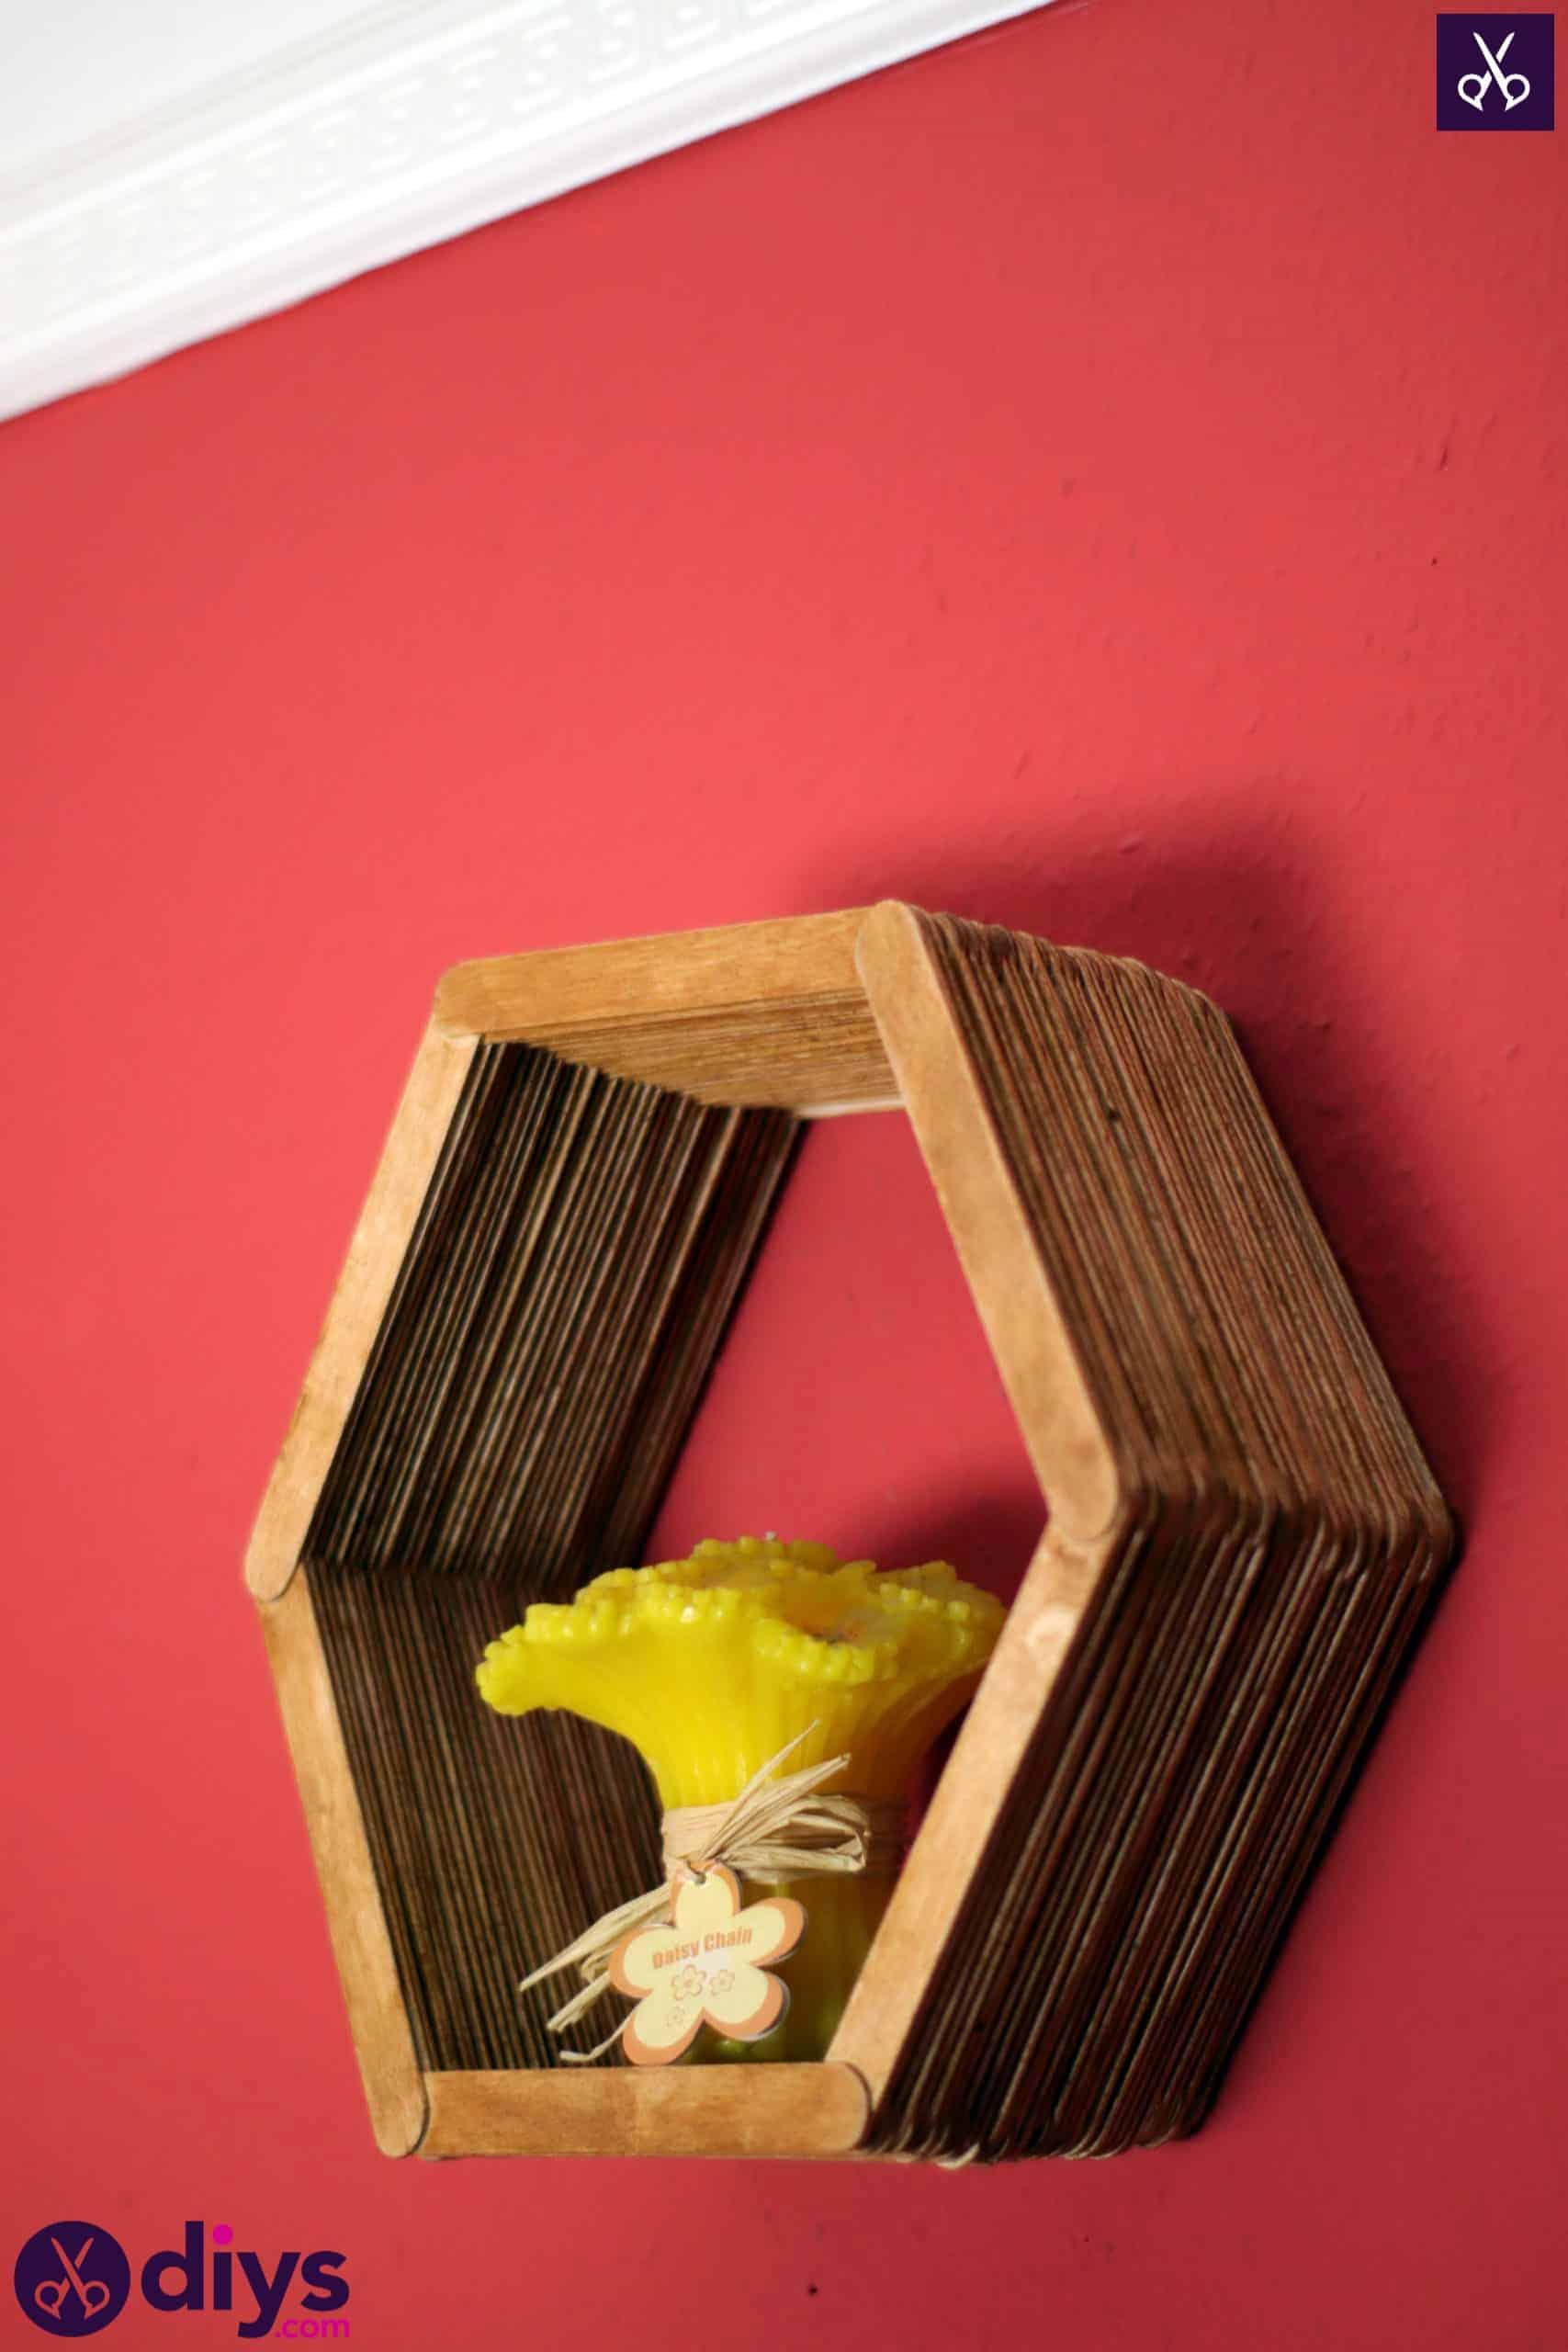 Diy popsicle stick hexagon shelf hang